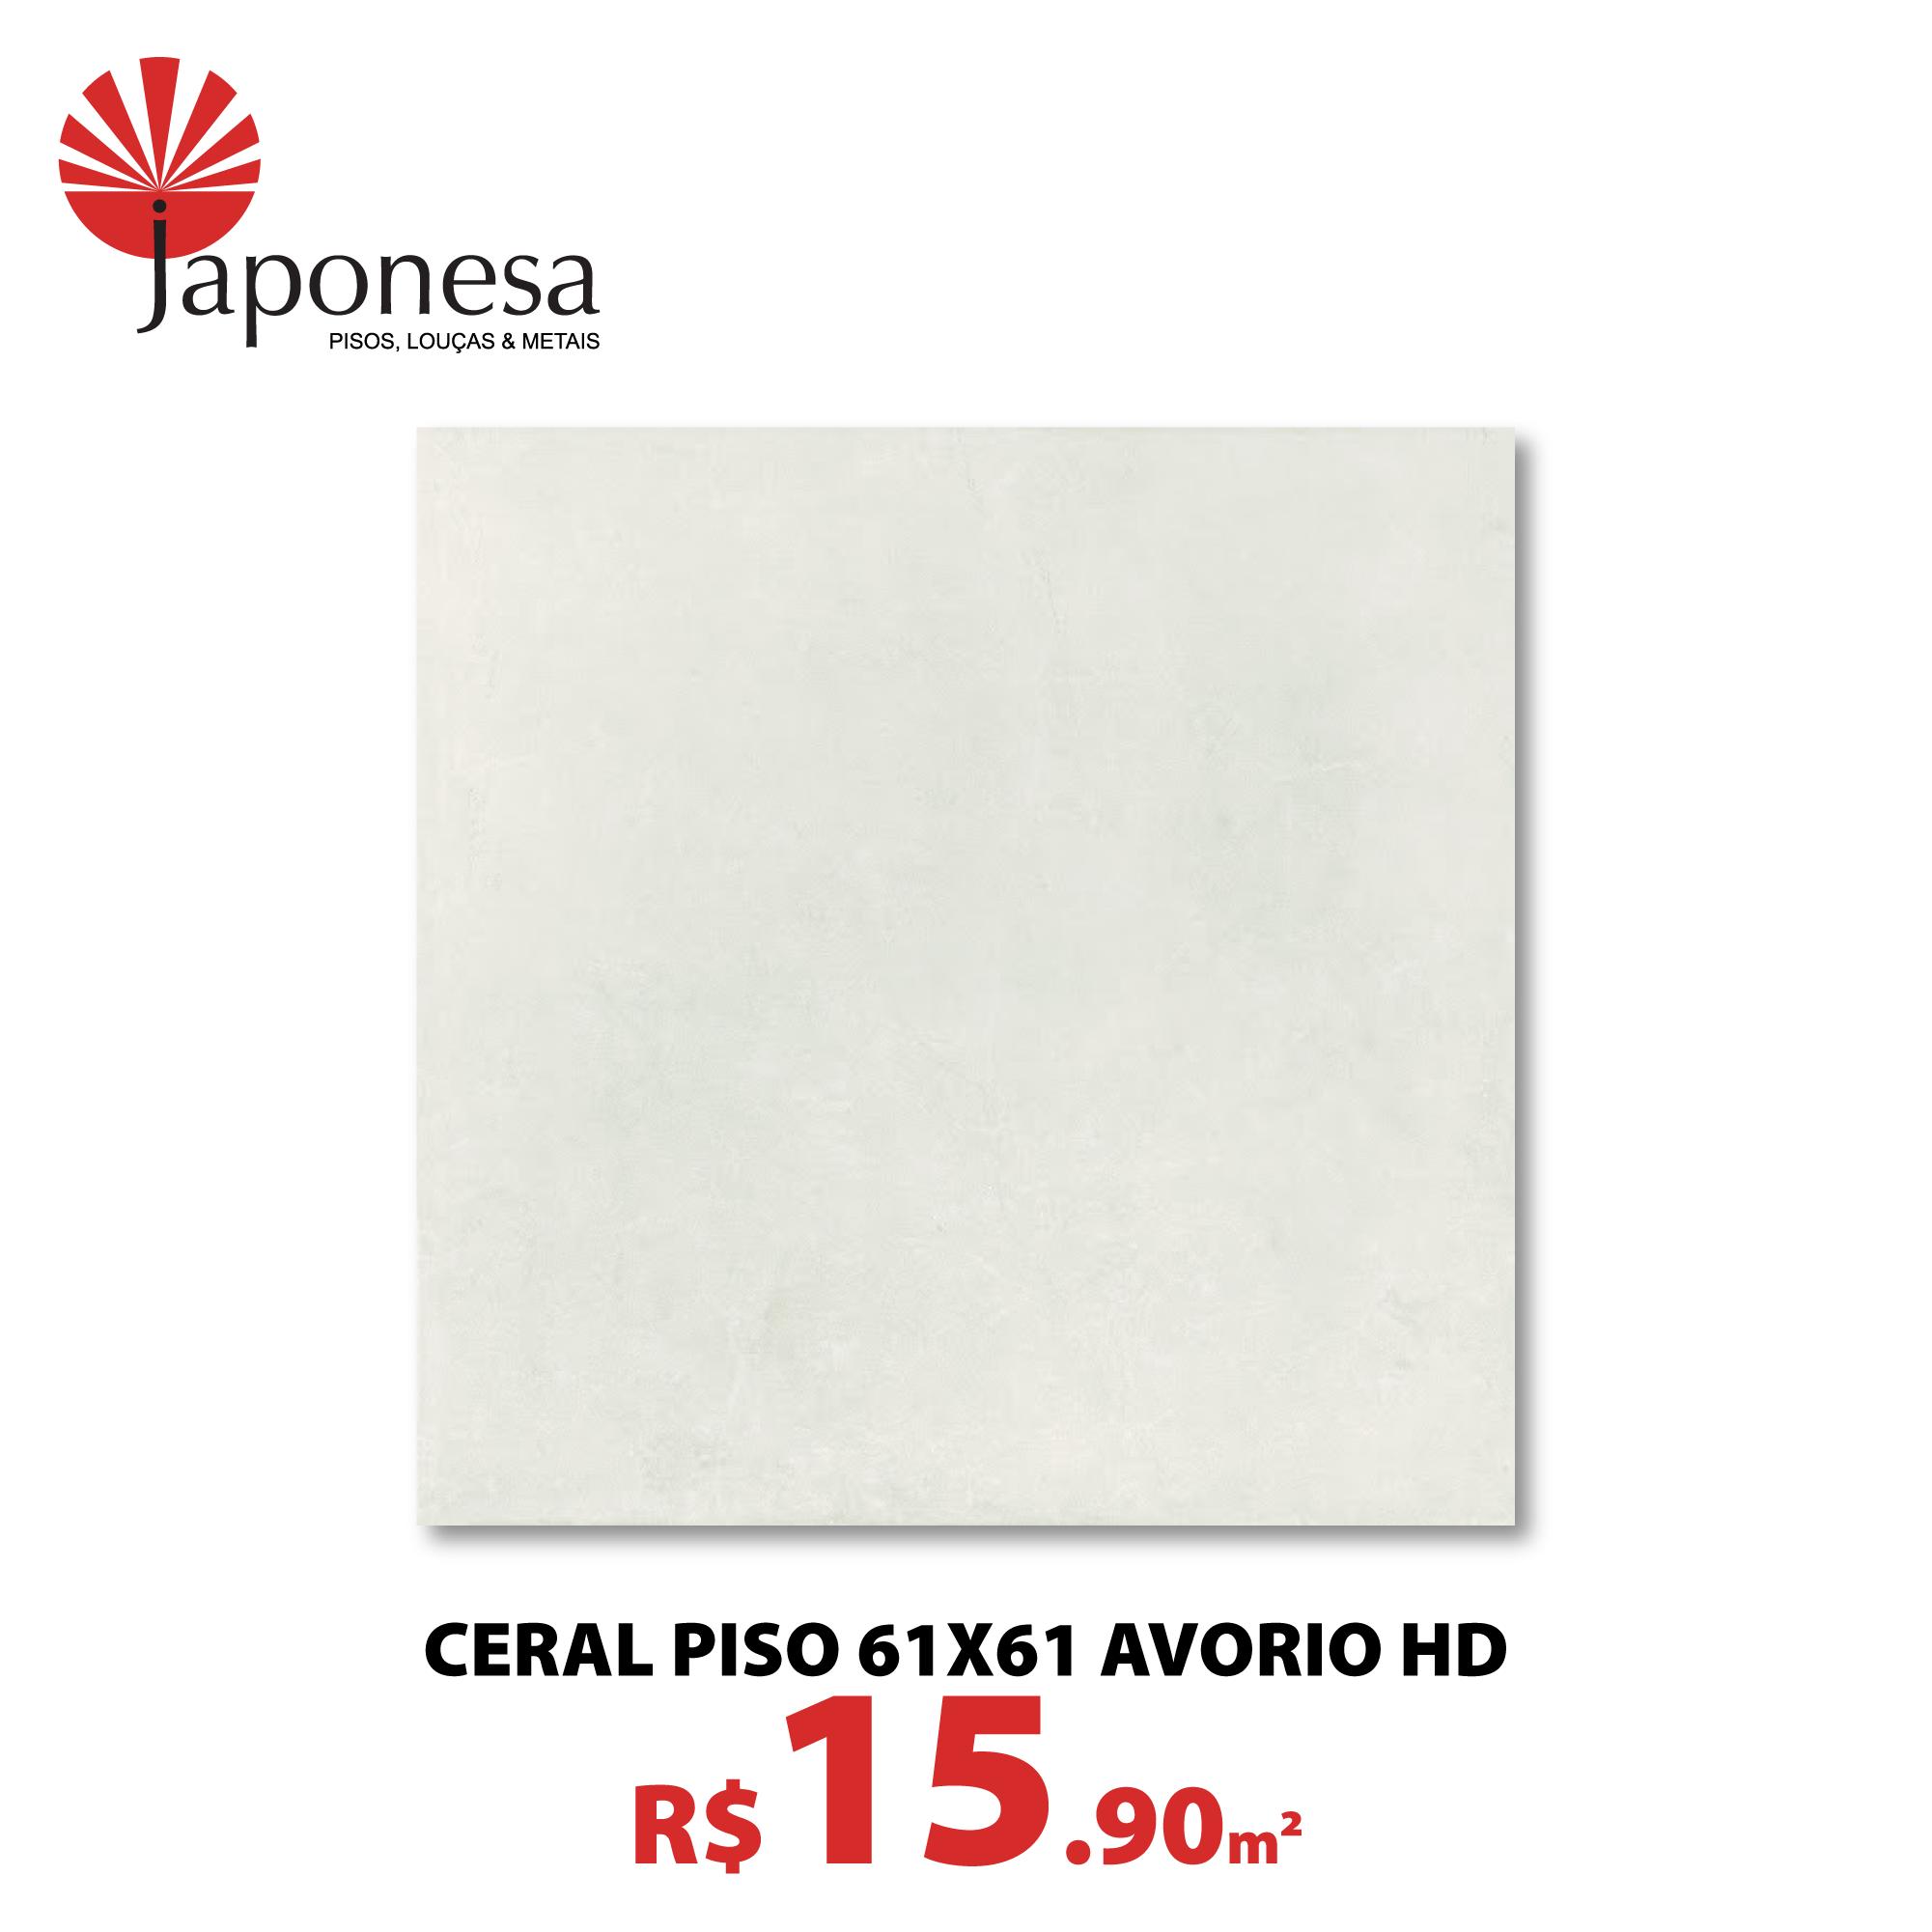 Ceral Piso 61×61 Avorio HD